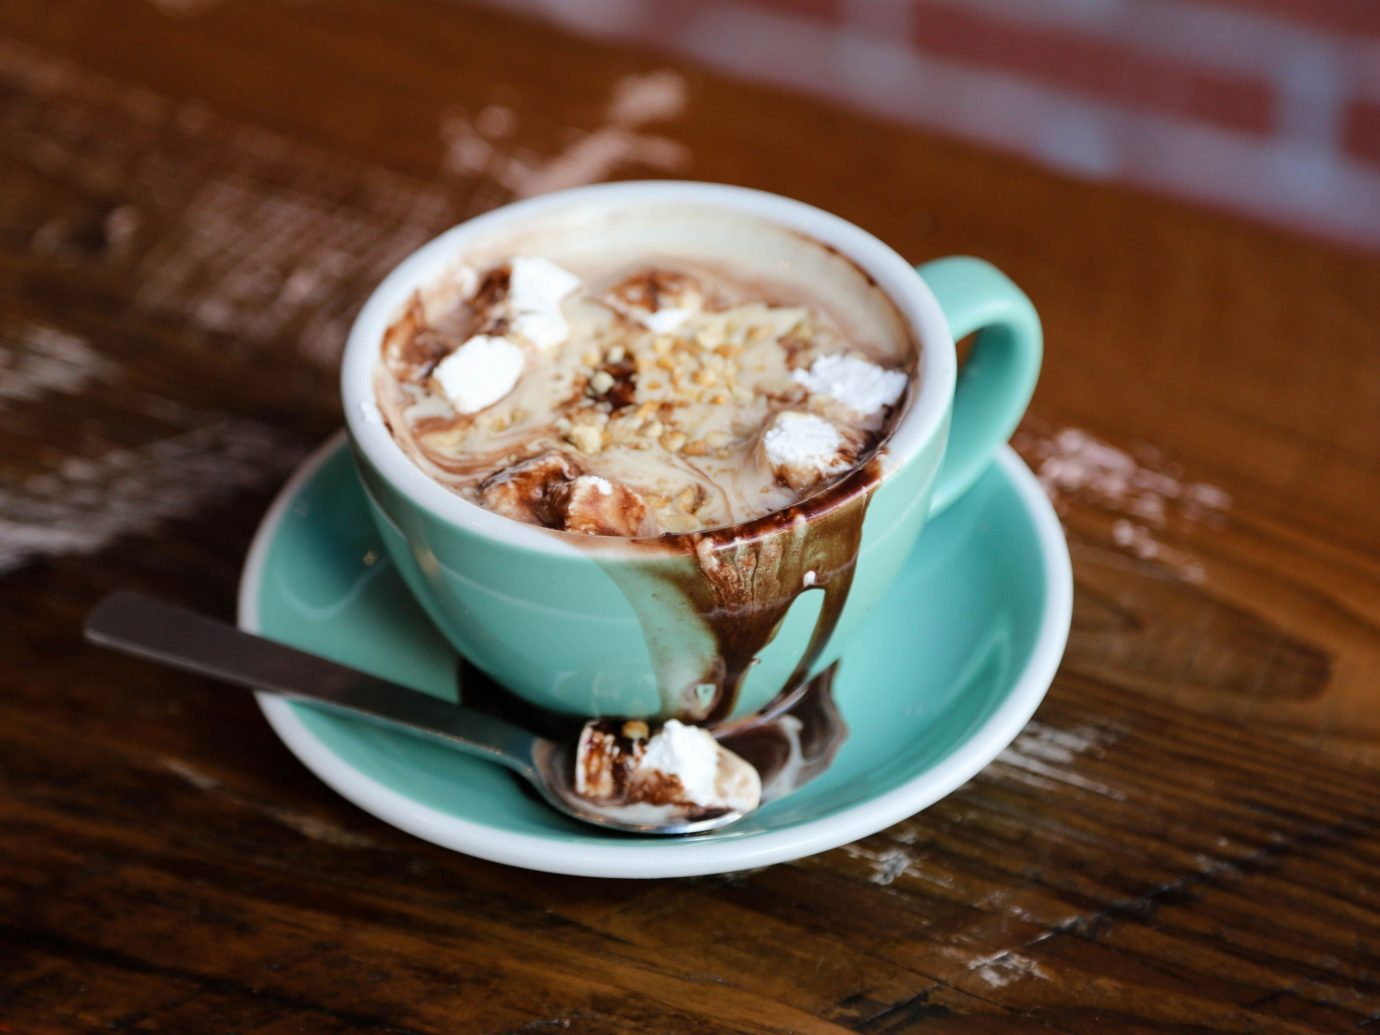 04e0c081c79 Food + Drink table cup coffee food floor plate indoor dish breakfast meal  dessert Drink hot